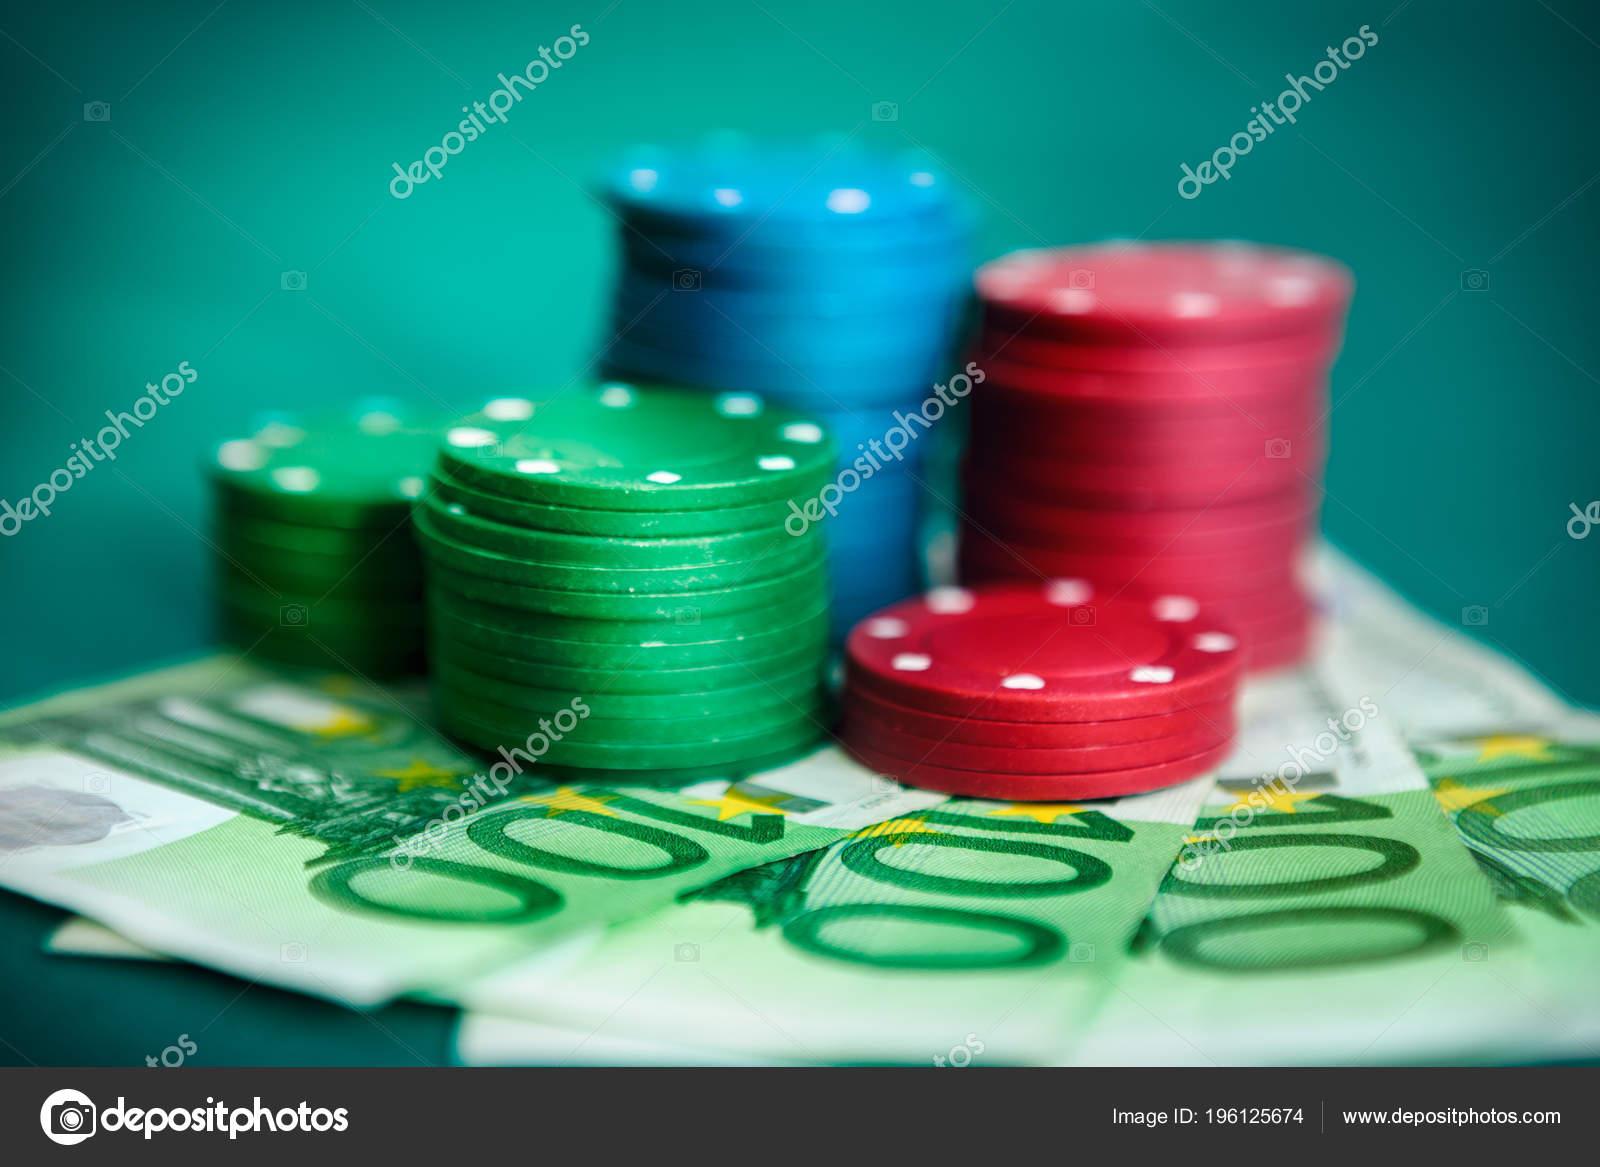 игра с деньгами на счету